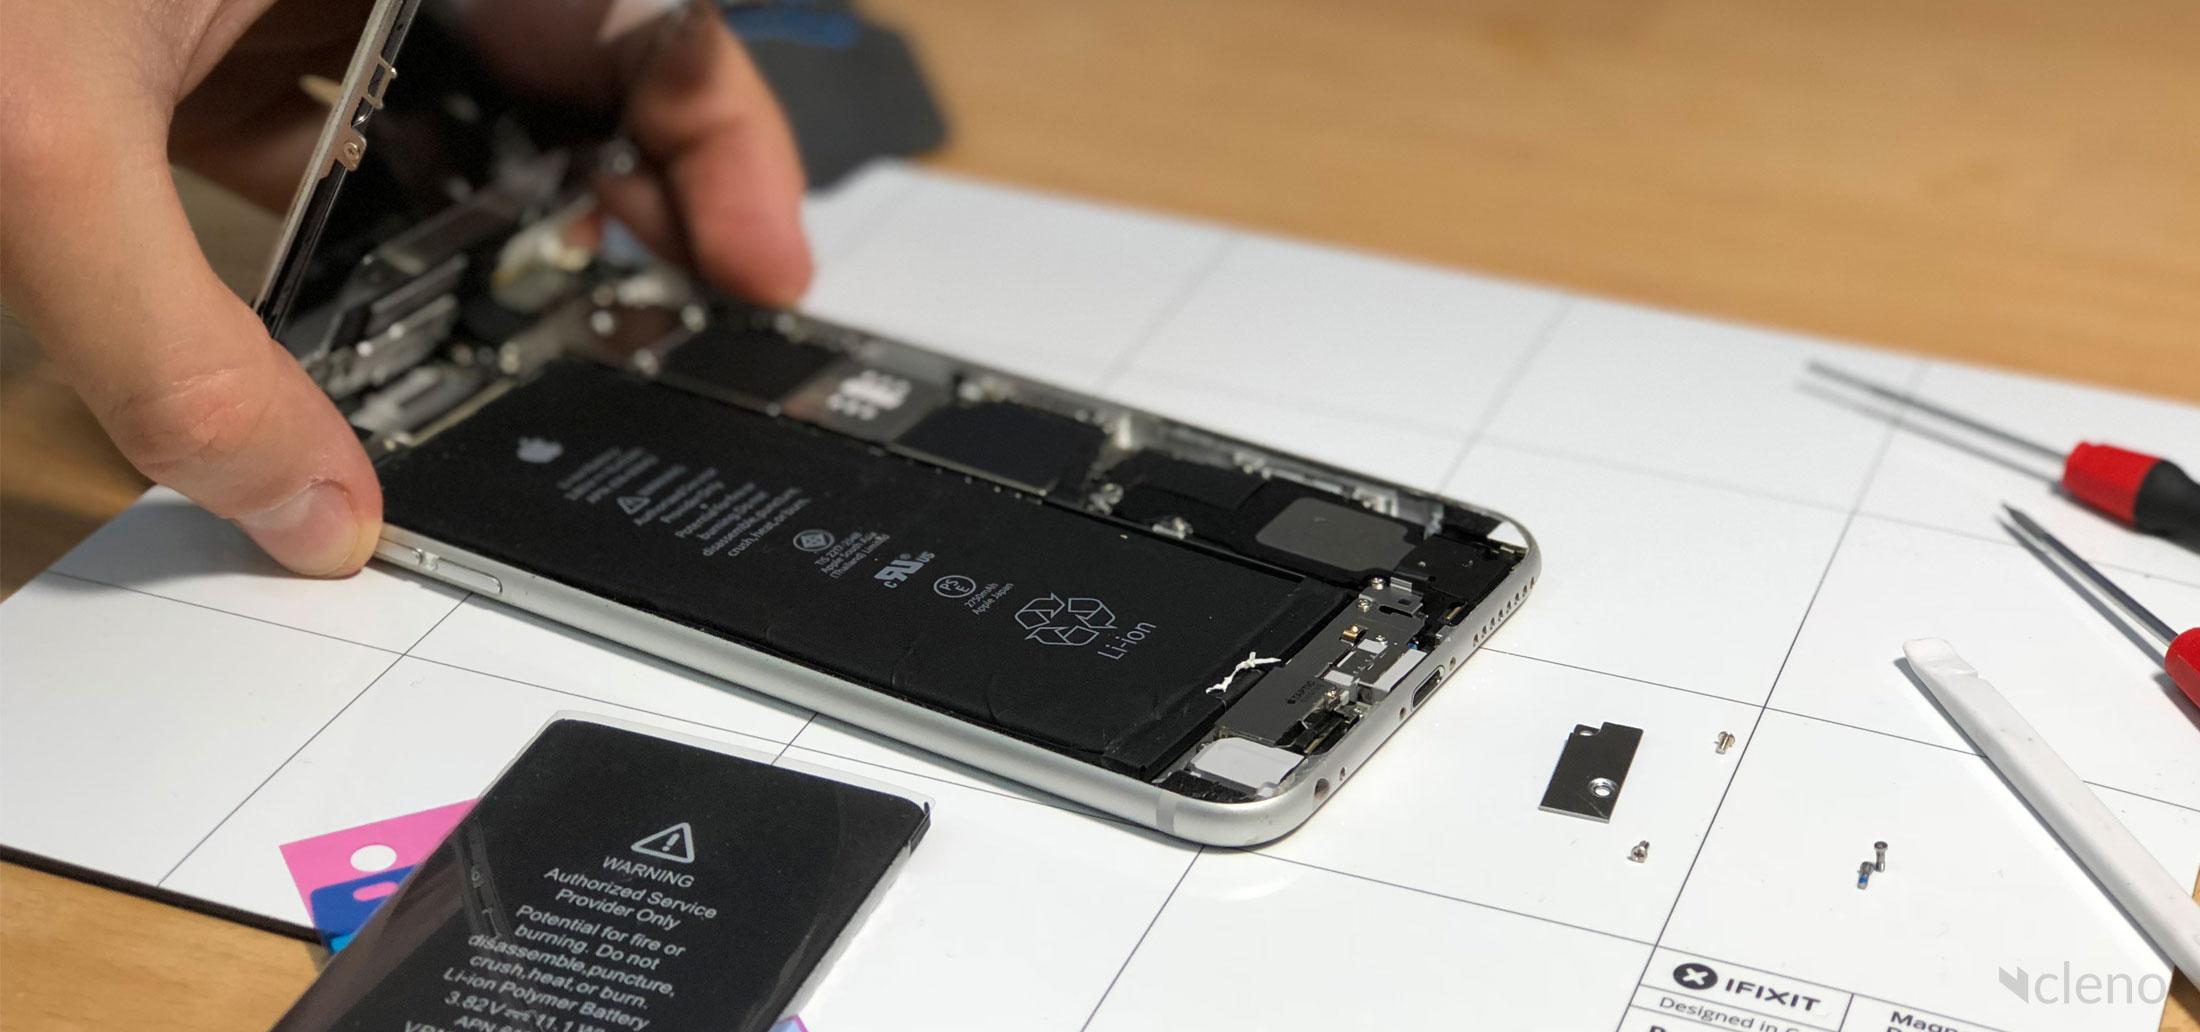 Iphone Tausch